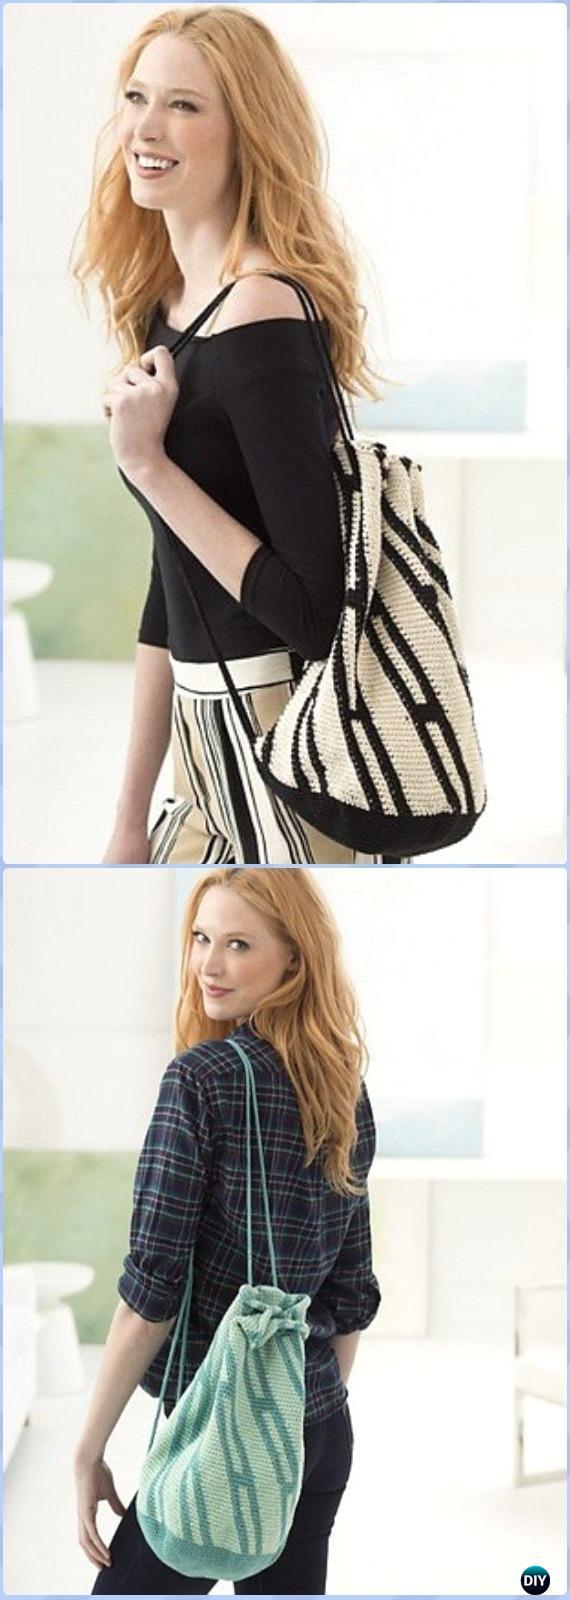 Crochet Encantada Bag/Backpack Free Pattern -Crochet Backpack Free Patterns Adult Version